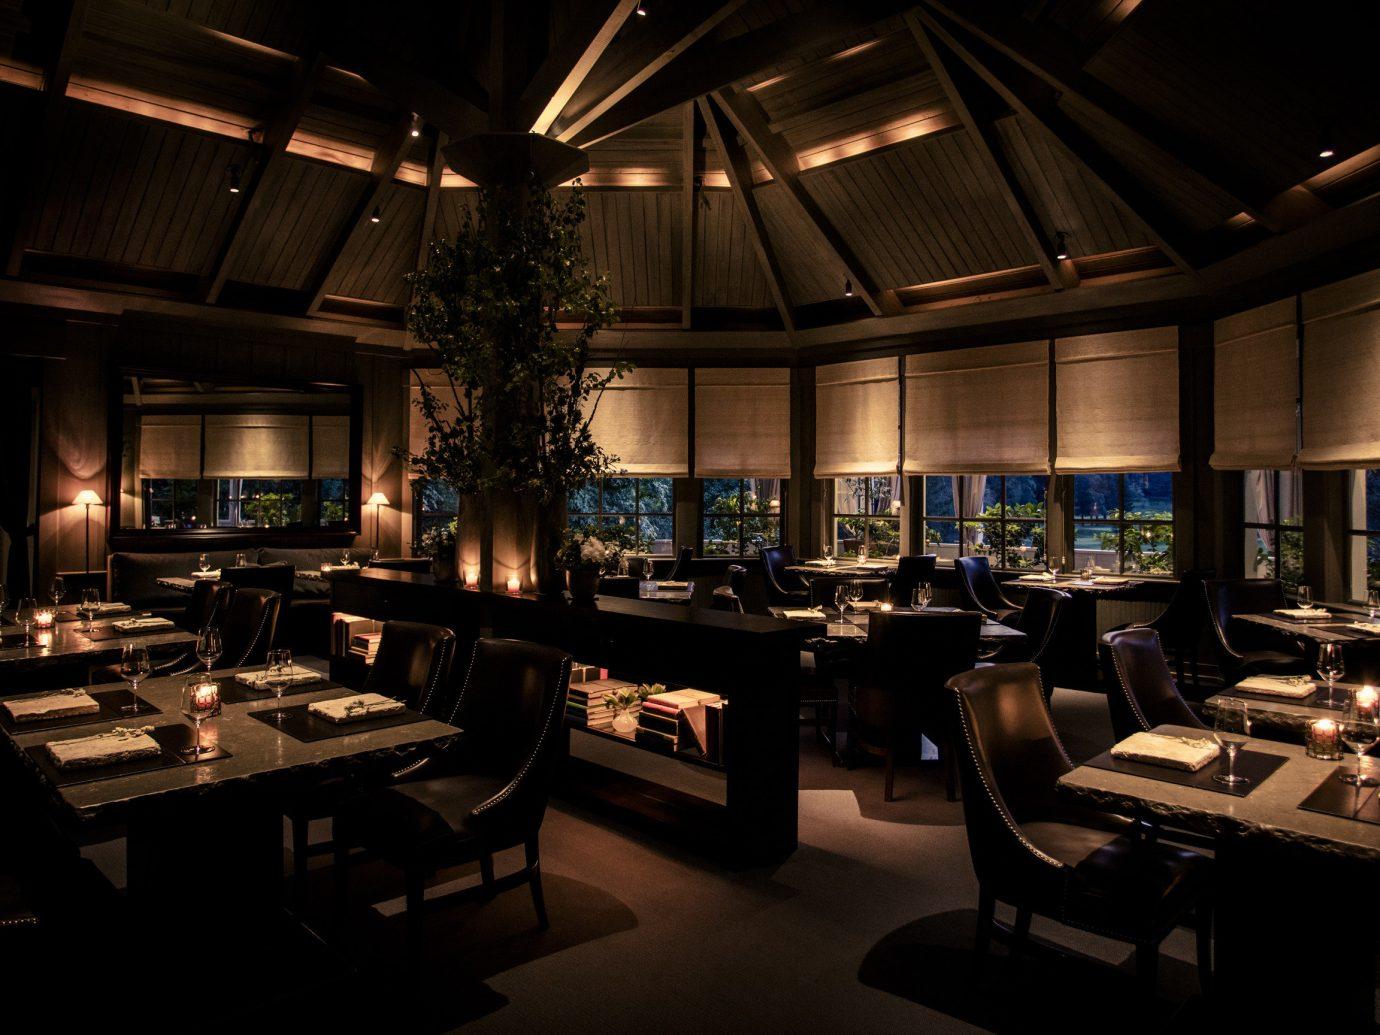 Hotels Romance Spa Retreats Trip Ideas indoor ceiling table restaurant room interior design function hall Island furniture Bar several